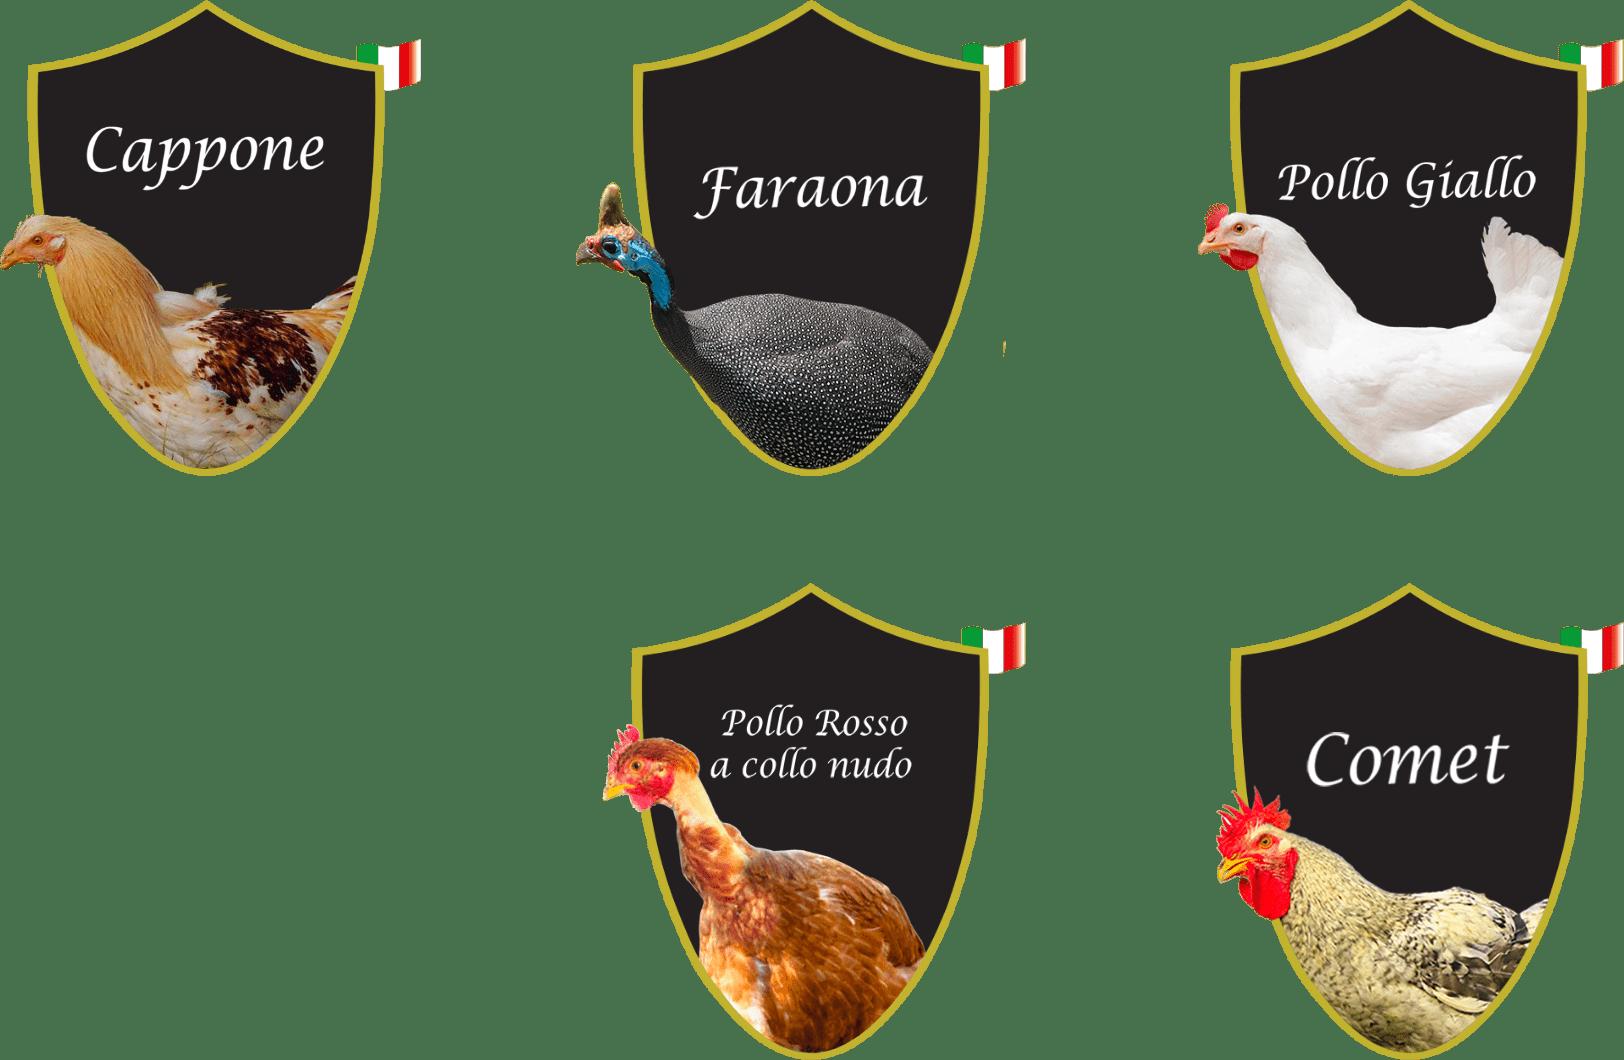 prodotti cinelli produzione carni bianche in toscana